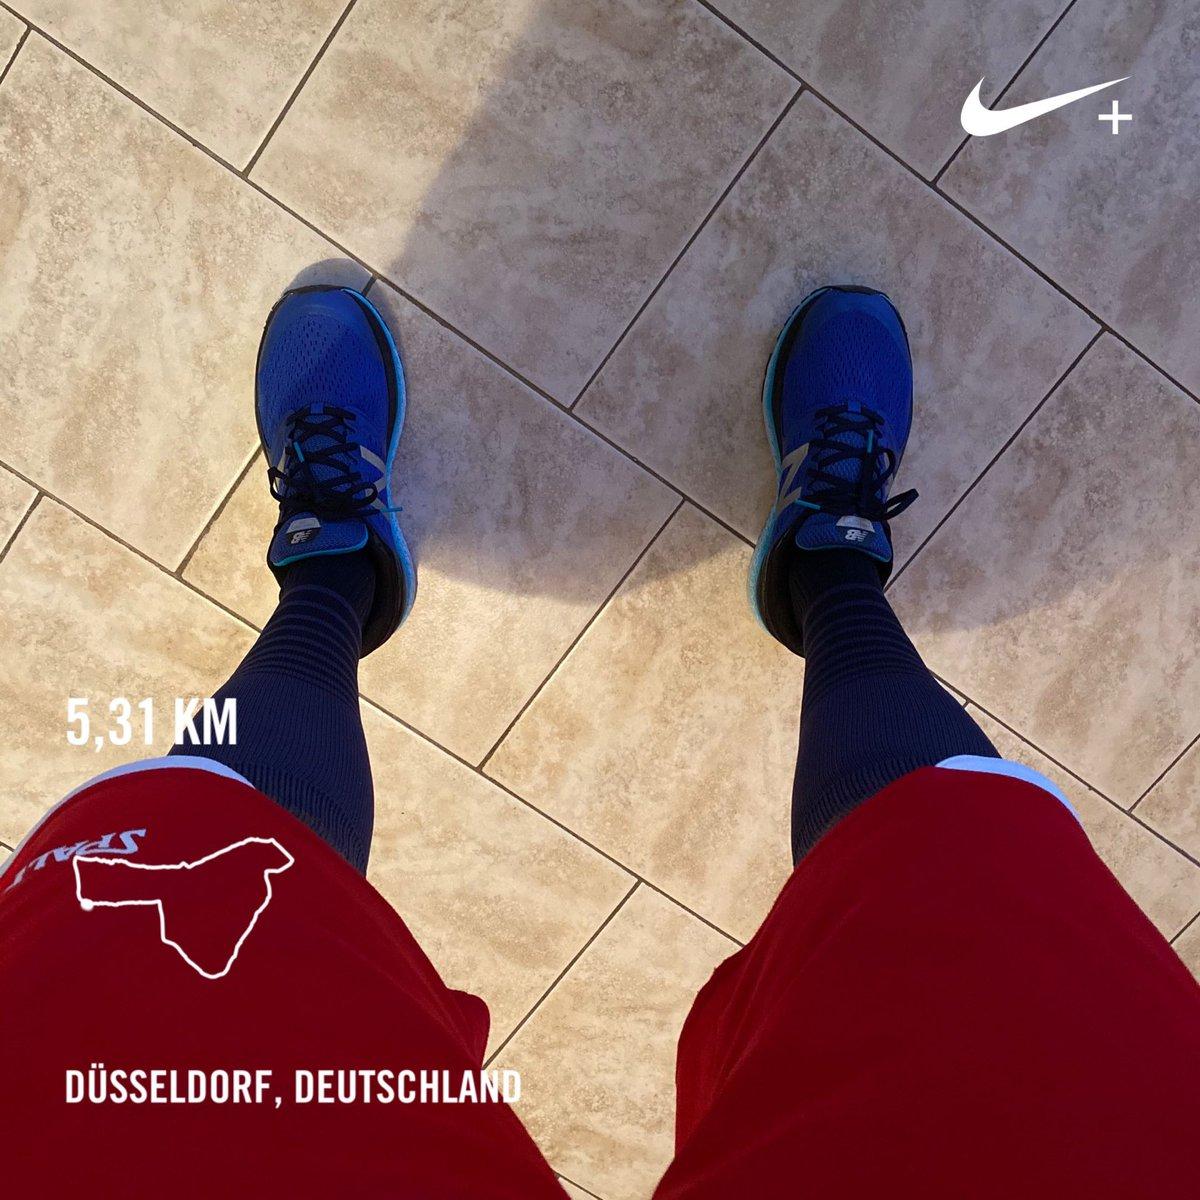 Eine schnelle Runde gedreht #runtraining #running #triathlontraining #triathlon #nevergiveup #laufliebe #garmin #comments #training #sport #run #mizuno #followme #триатлон #triathlete #thewaytocolognetria2018 #runningman #nonstop #likes #fitness #triforlife #tri #swimbikerunpic.twitter.com/ubj4qWImIU